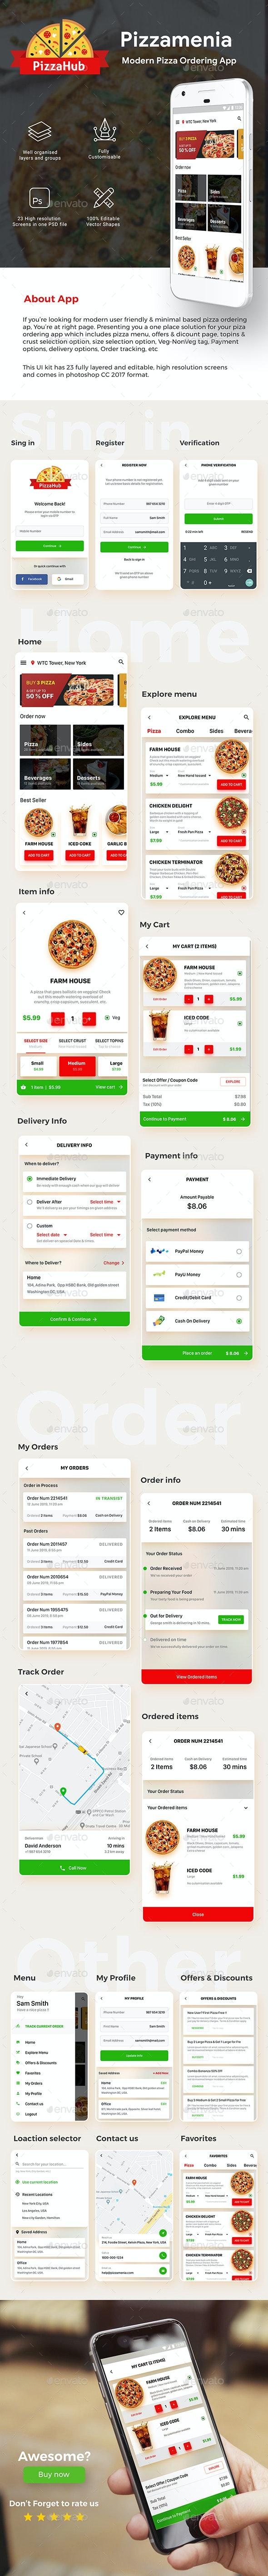 Pizza Ordering & Delivering App UI Kit | Pizzamenia - User Interfaces Web Elements